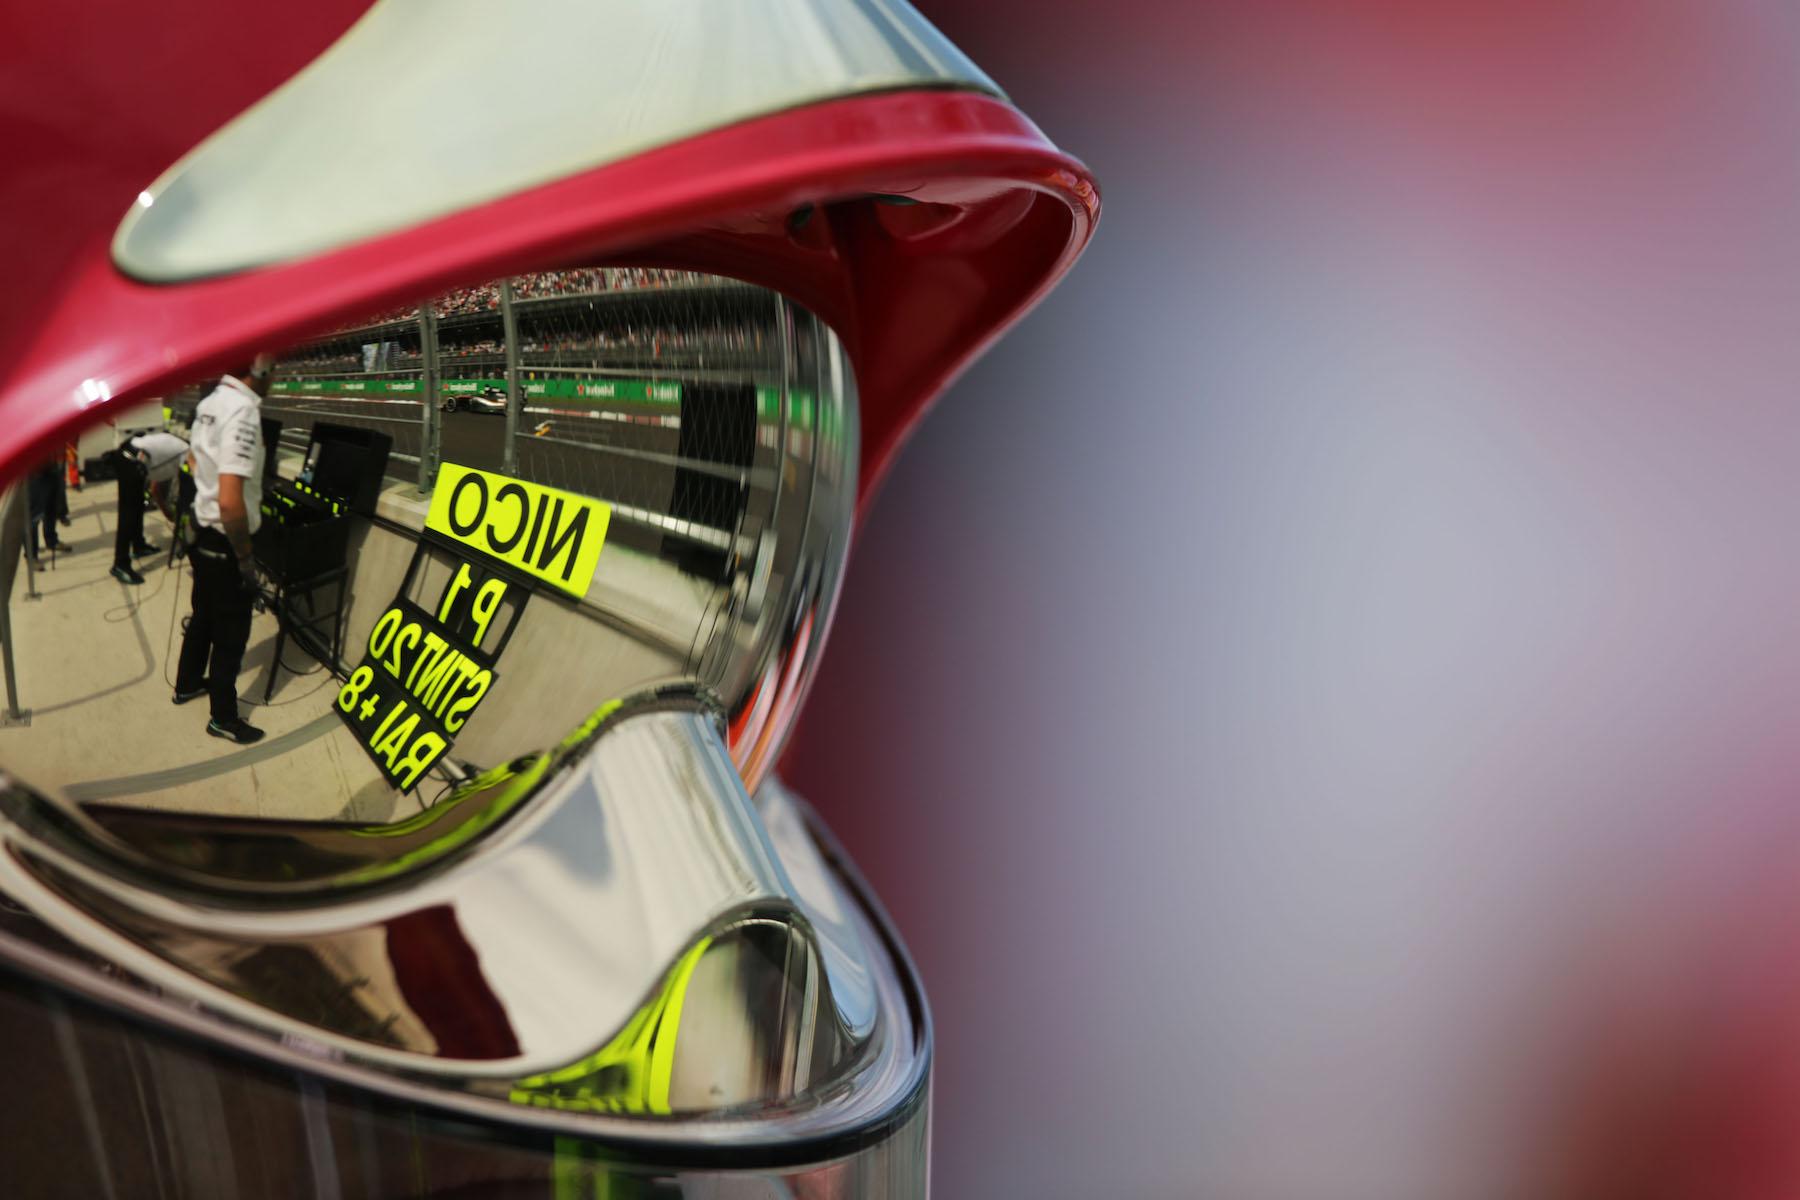 Salracing - Reflection on a helmet